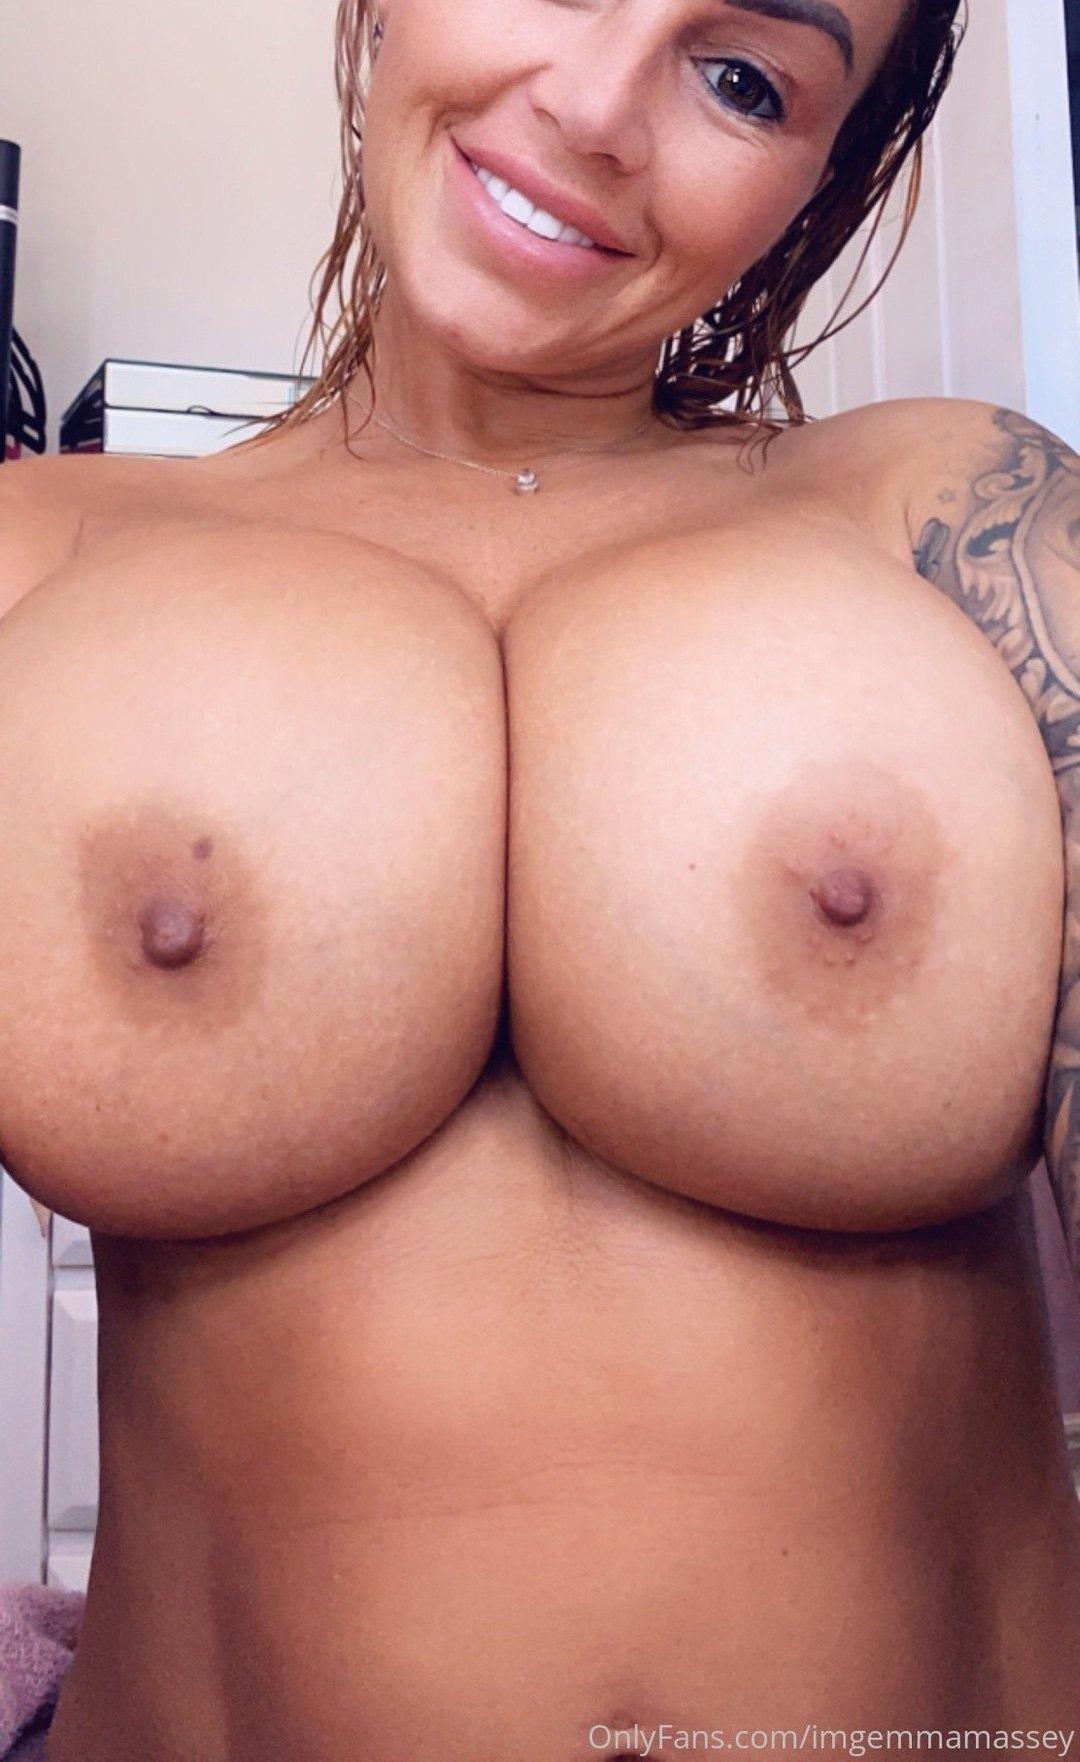 Gemma Massey Imgemmamassey Onlyfans Nudes Leaks 0032